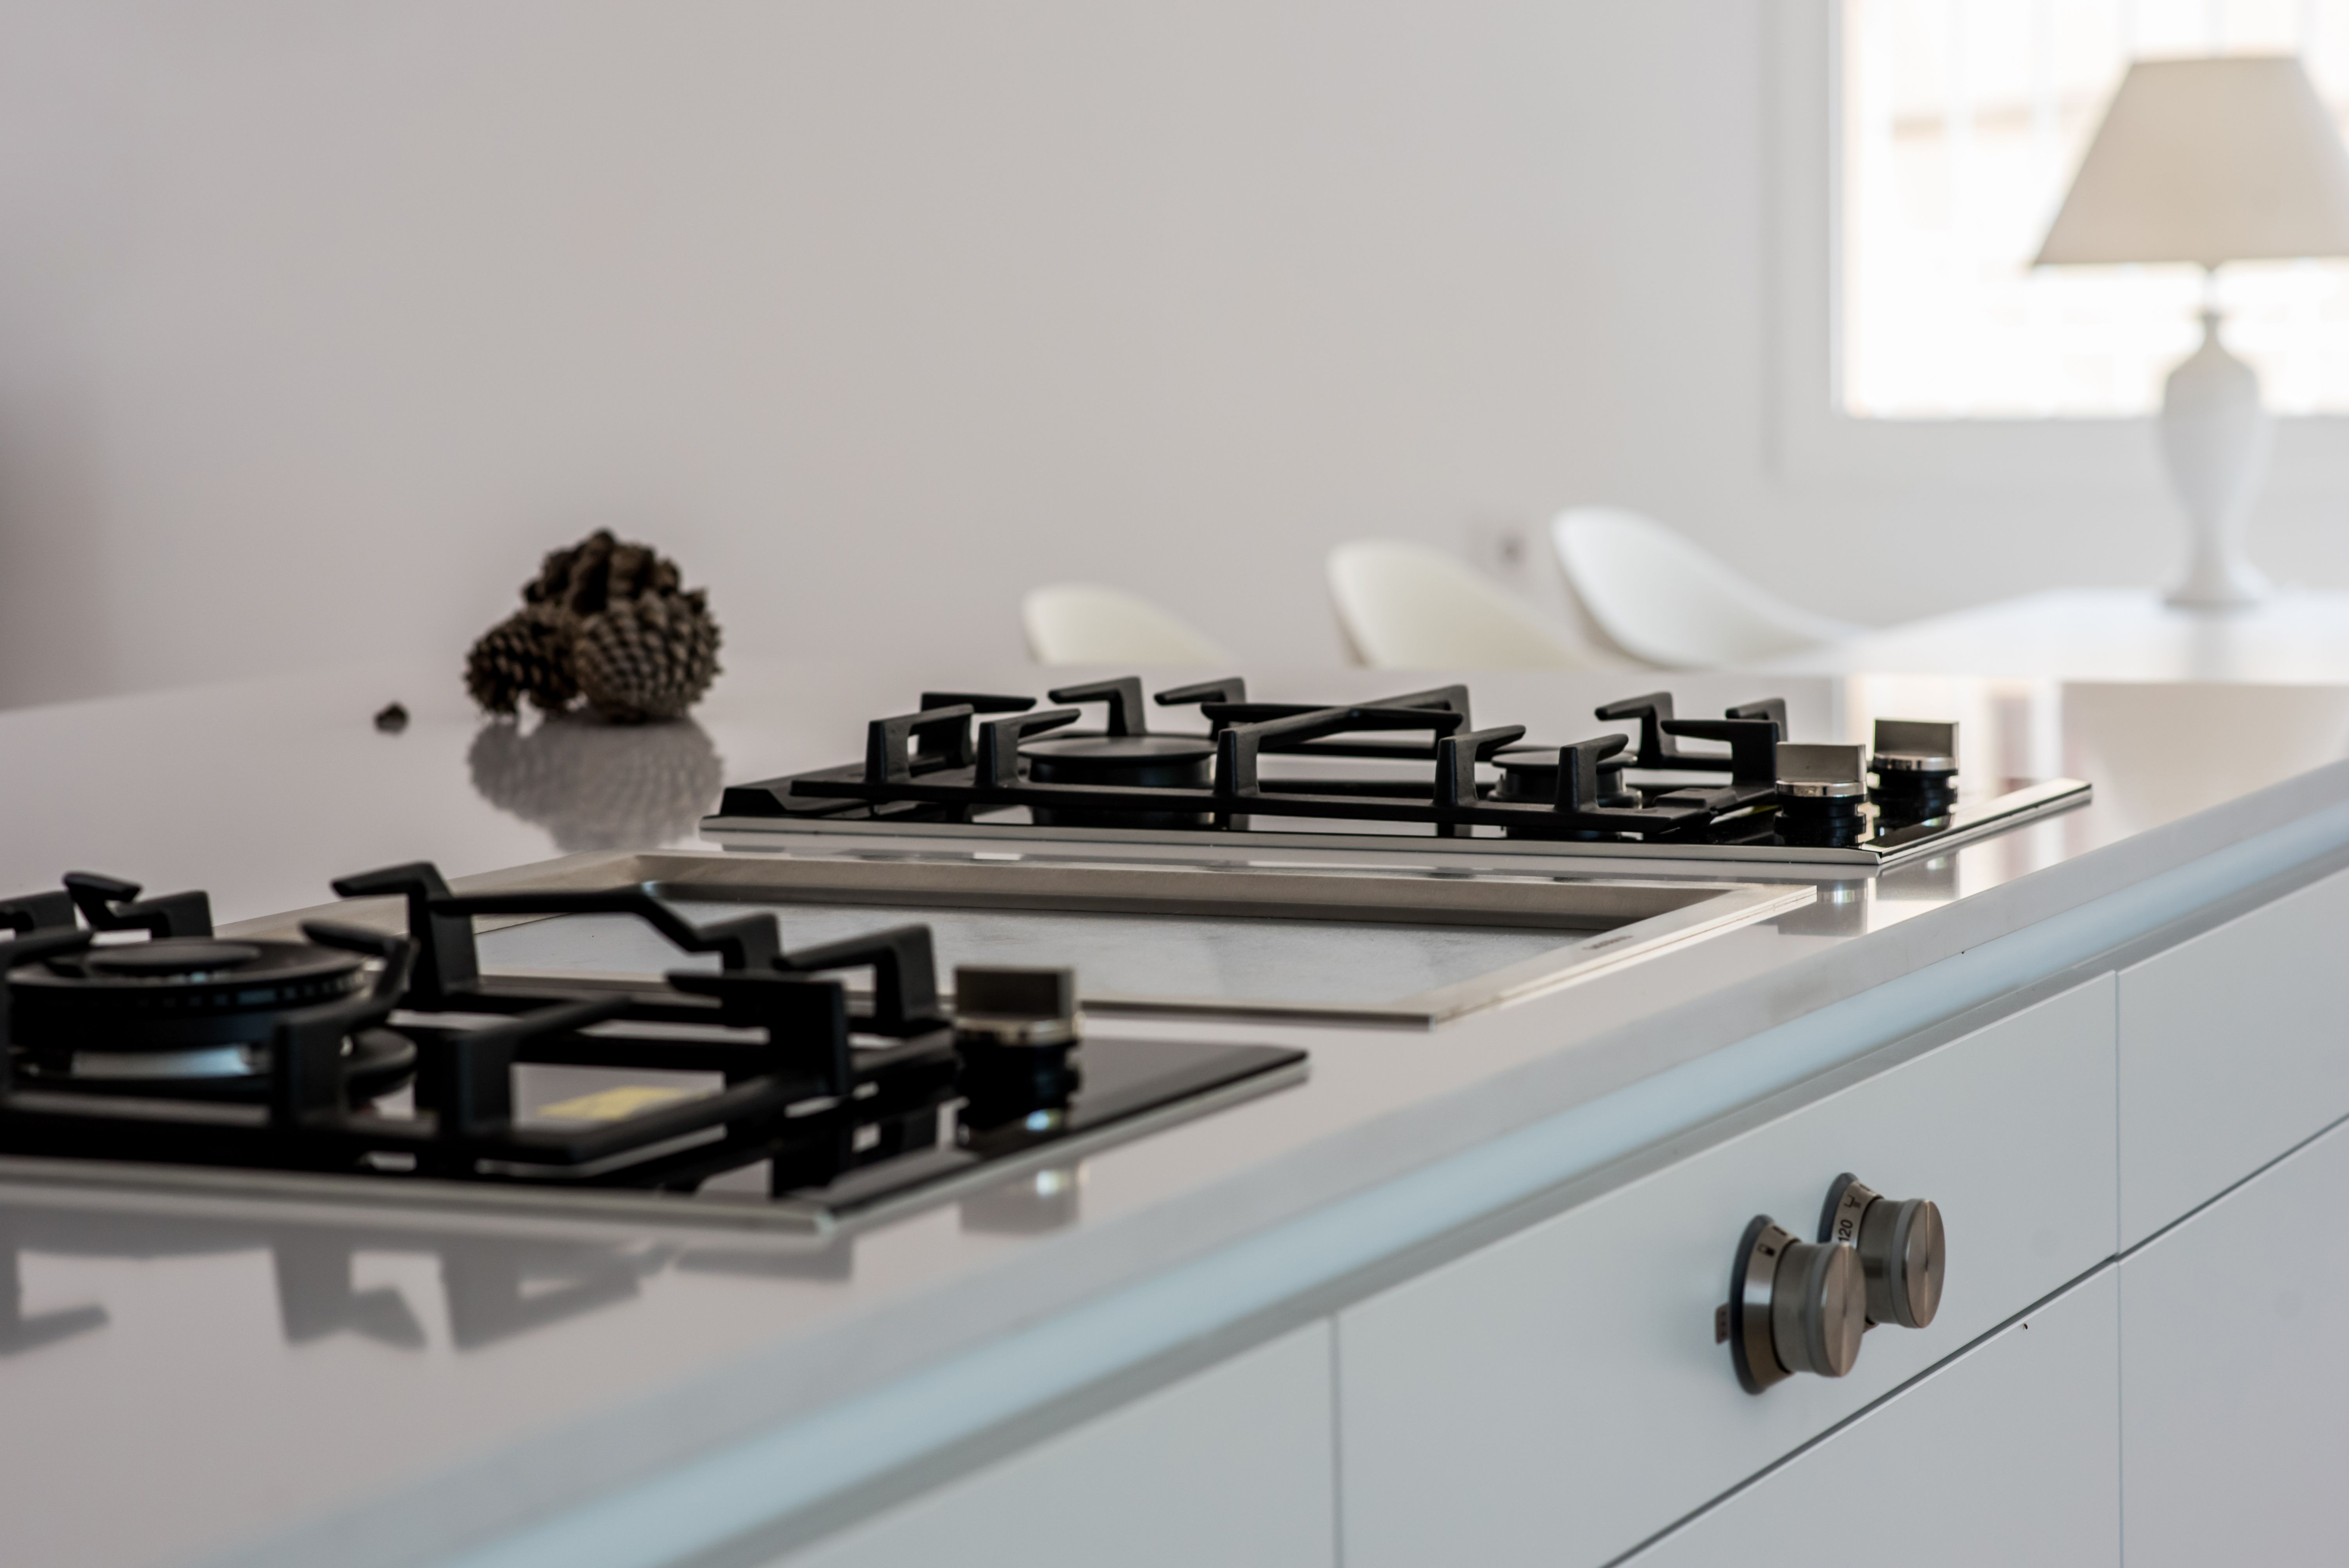 Proyecto Realizado Por Kualia En Colaboracion Con Clysa Cocina De